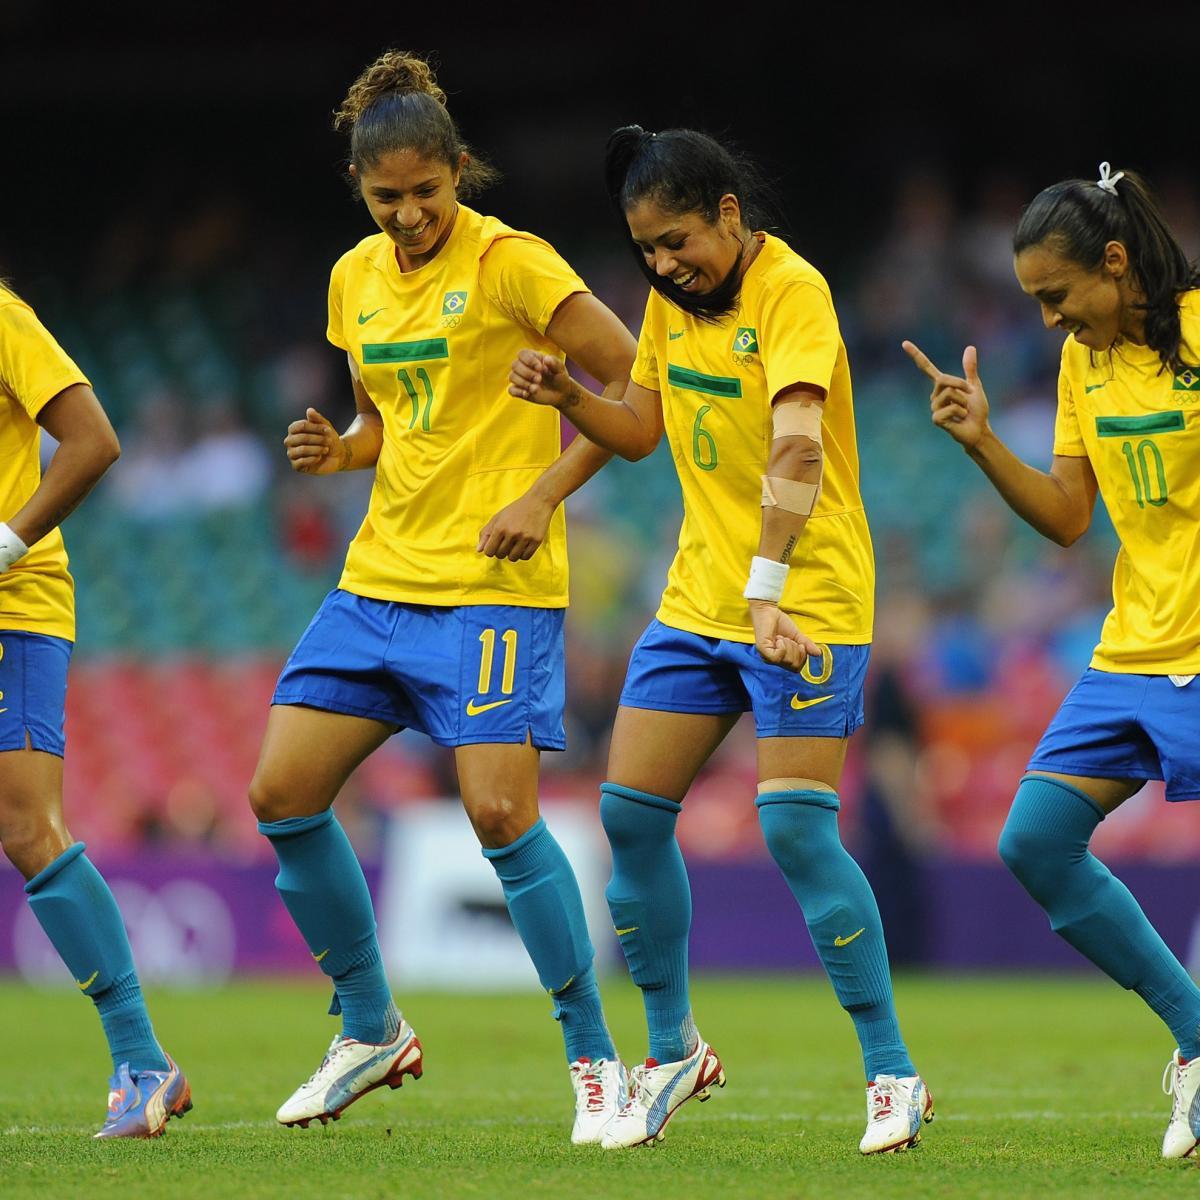 Women's Olympic Soccer 2012: Best 5 Players So Far ...